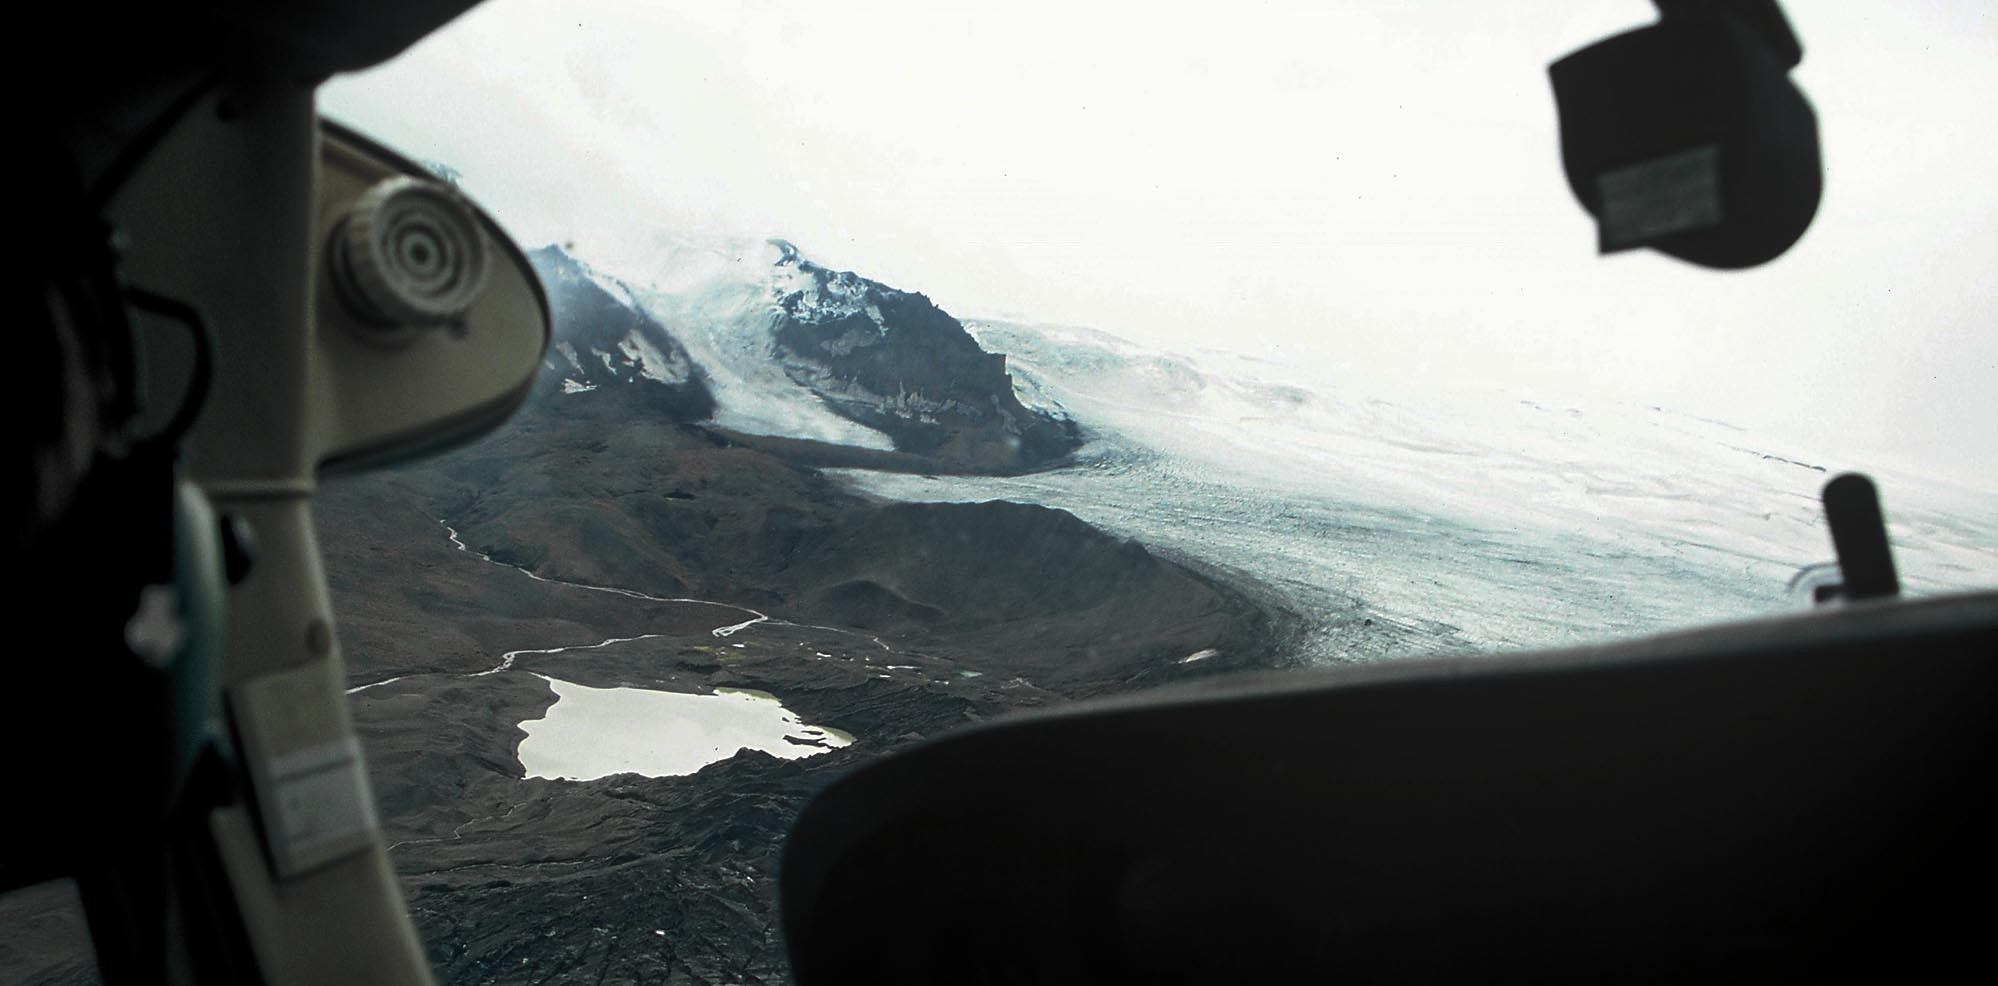 island-flugzeug-vatnajoekul-small